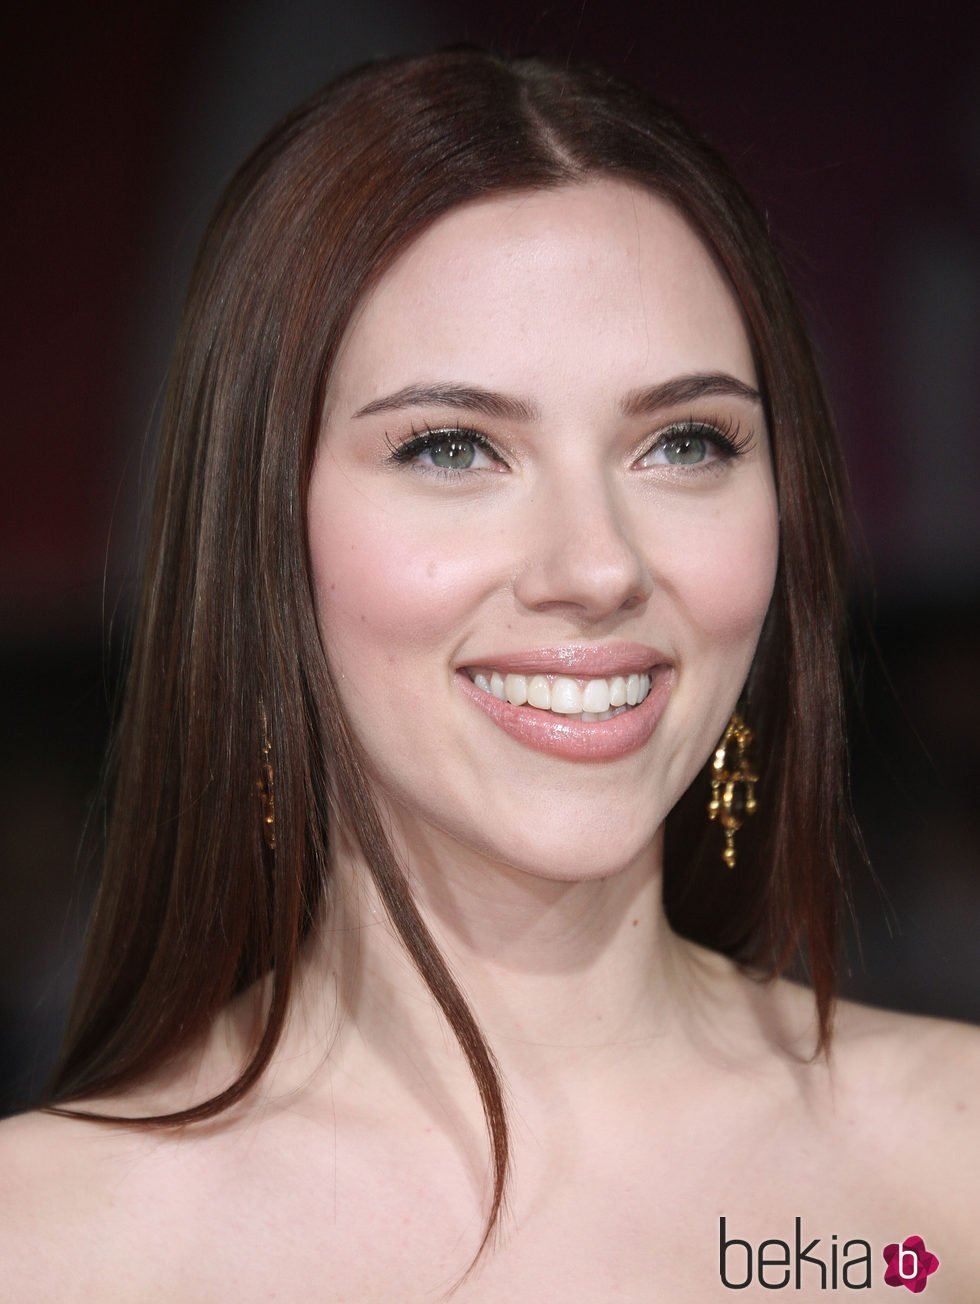 Scarlett Johansson en Premiere de Warner Bros. 'He's Just Not That Into You' en 2009